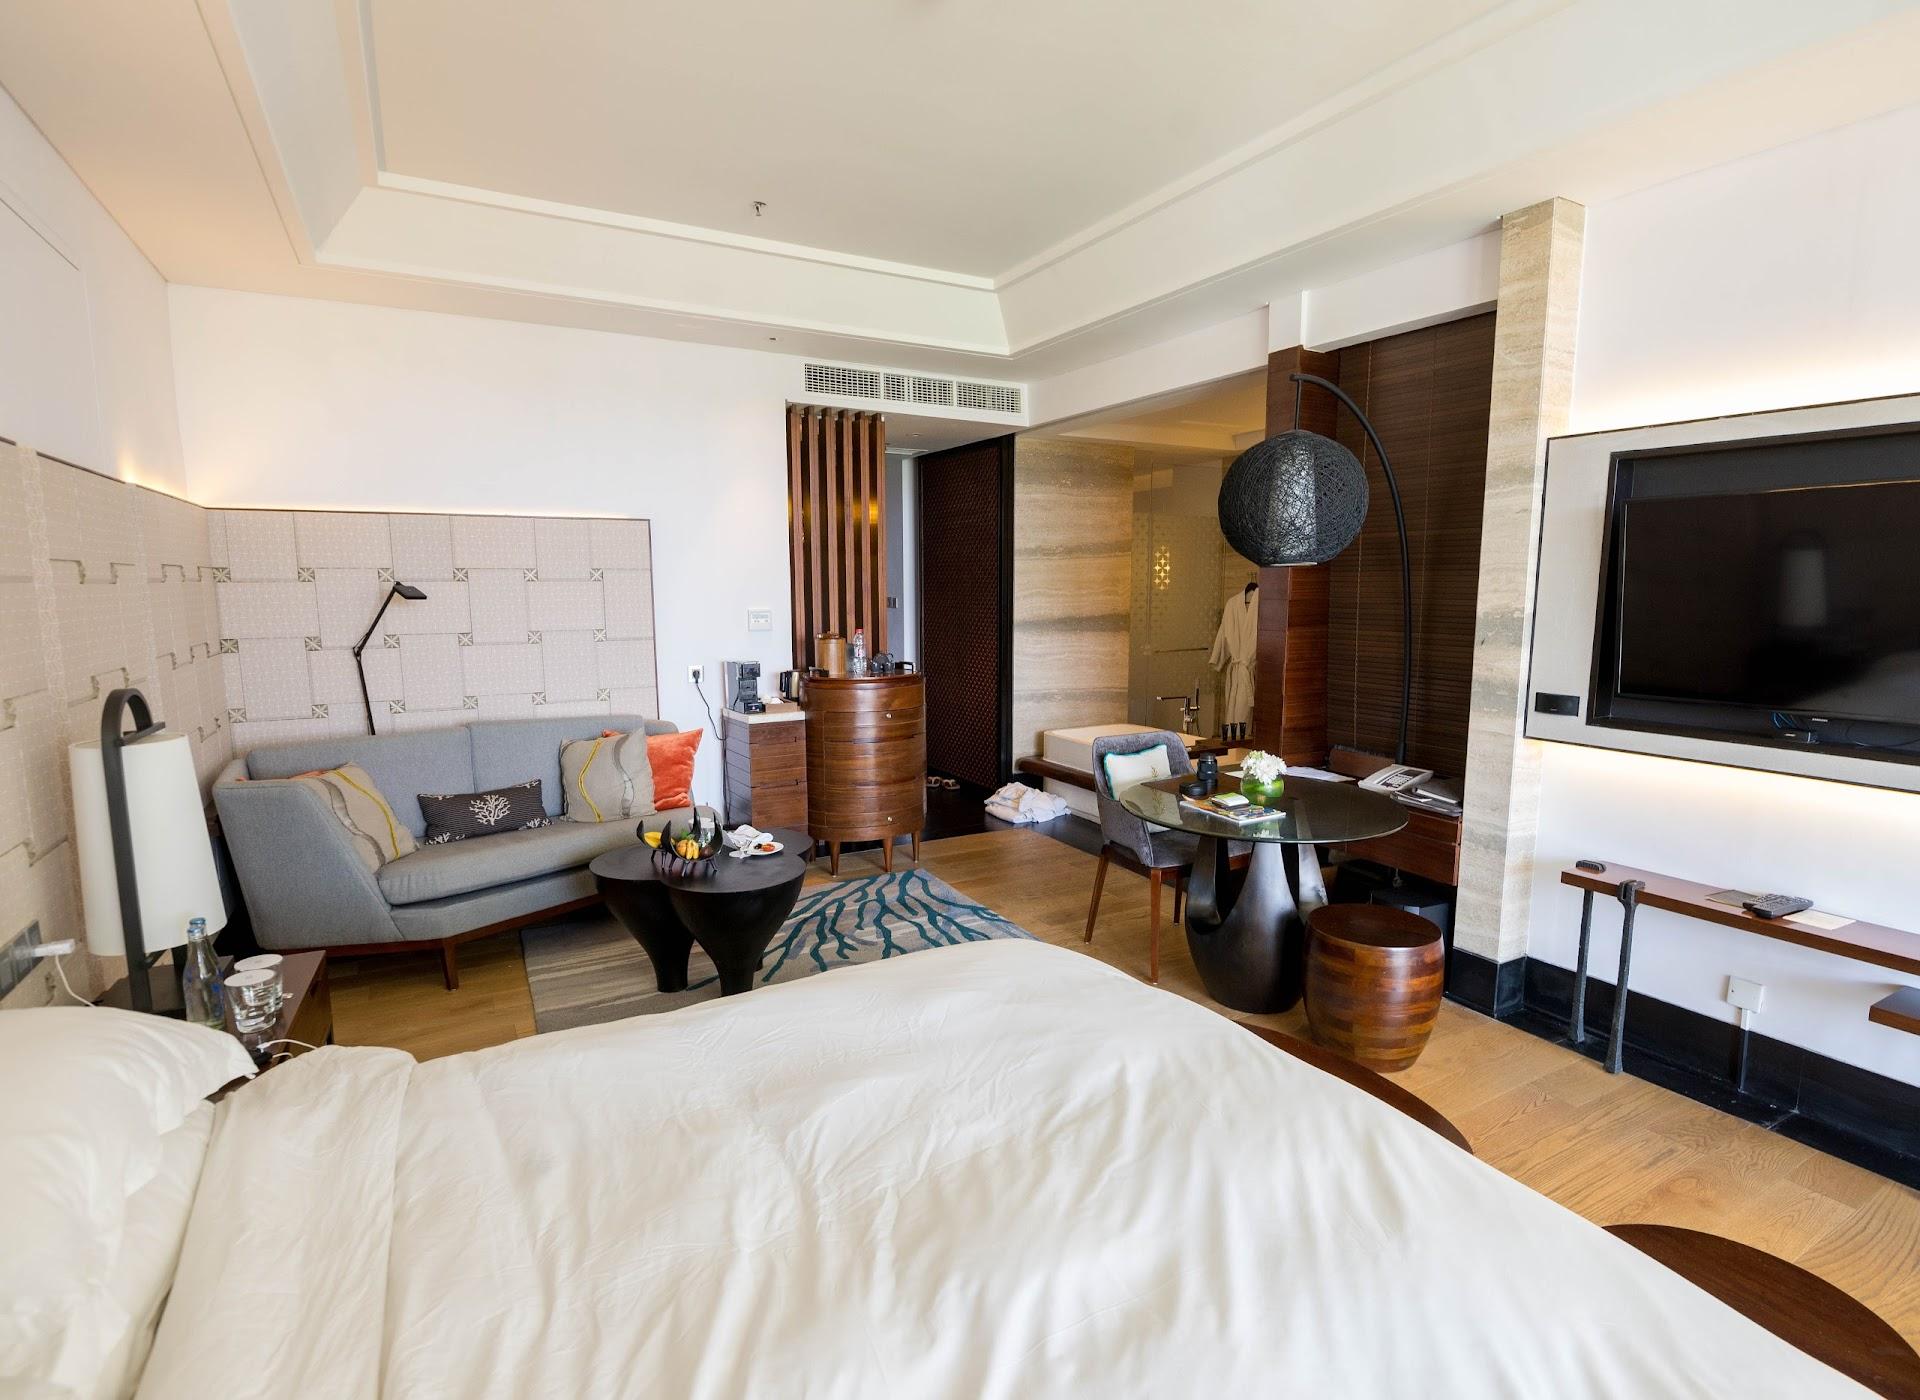 best hotels in bali, honeymoon resort, bali nusa dua, travel blog, couple travel bloggers, asian korean blogger, japanese, california san francisco bay area travel blogger, value hotels in bali, southeast asia